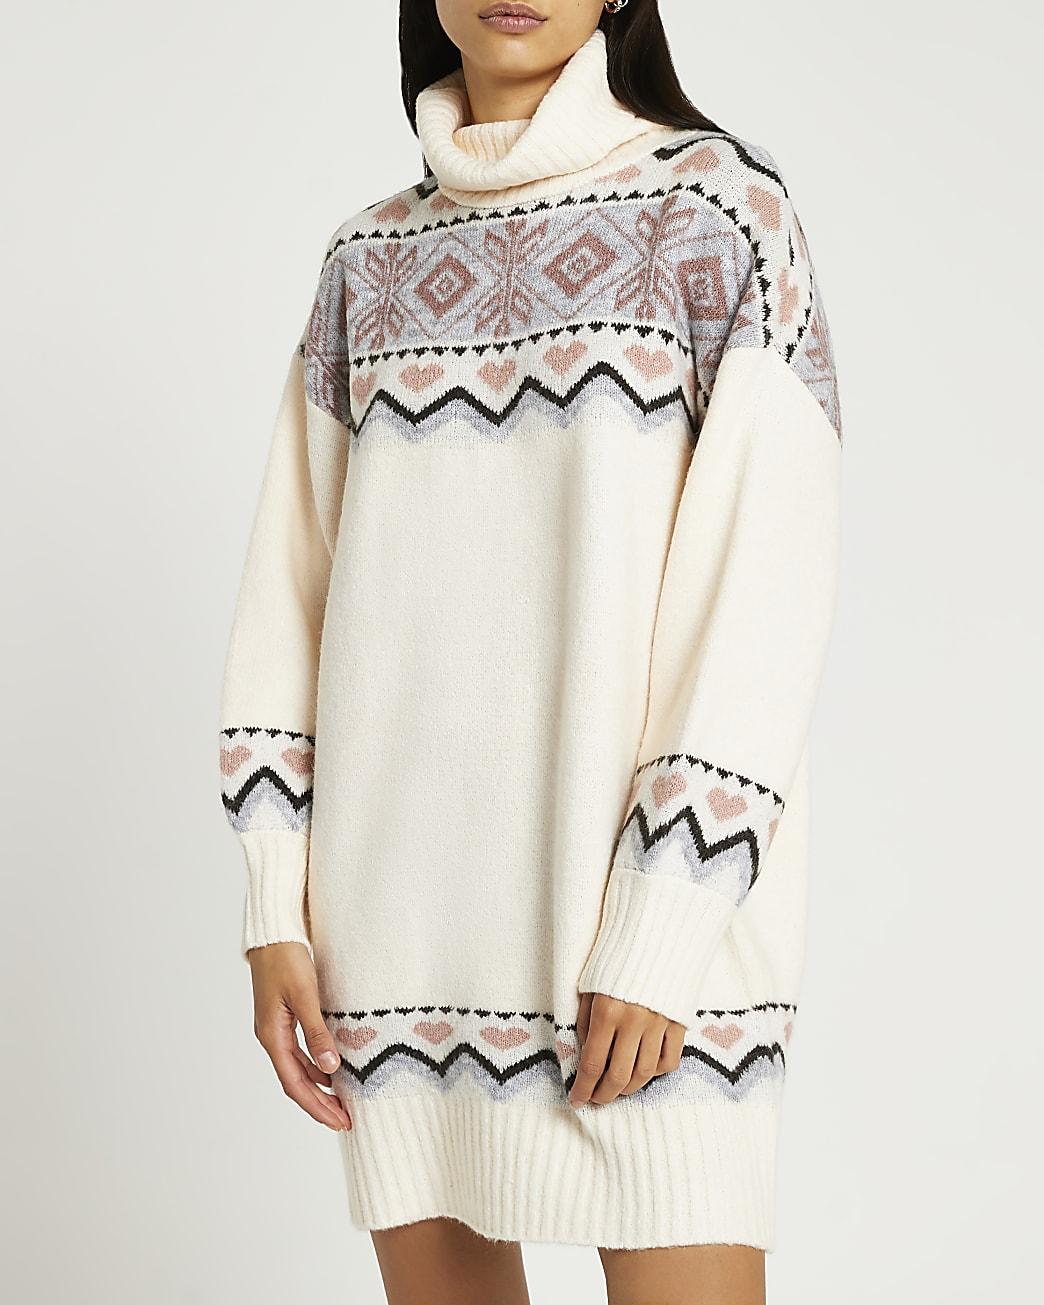 Cream fairisle knitted roll neck dress